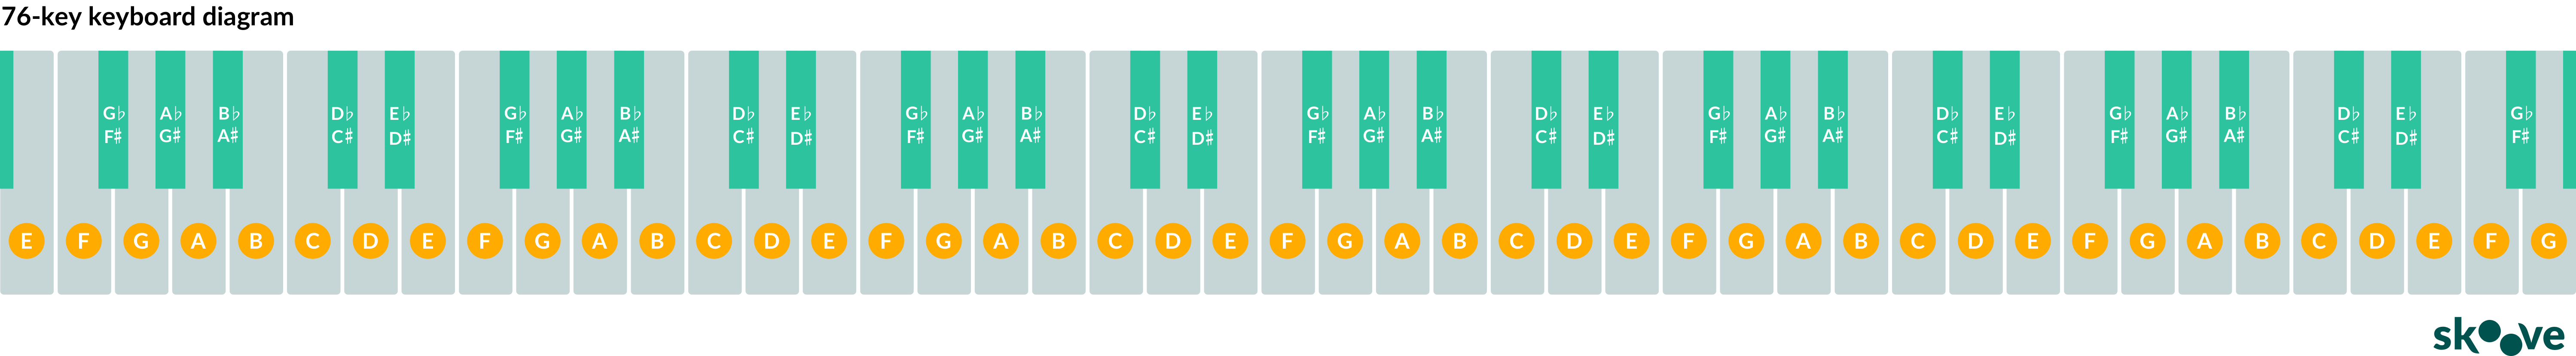 76 keyboard diagram